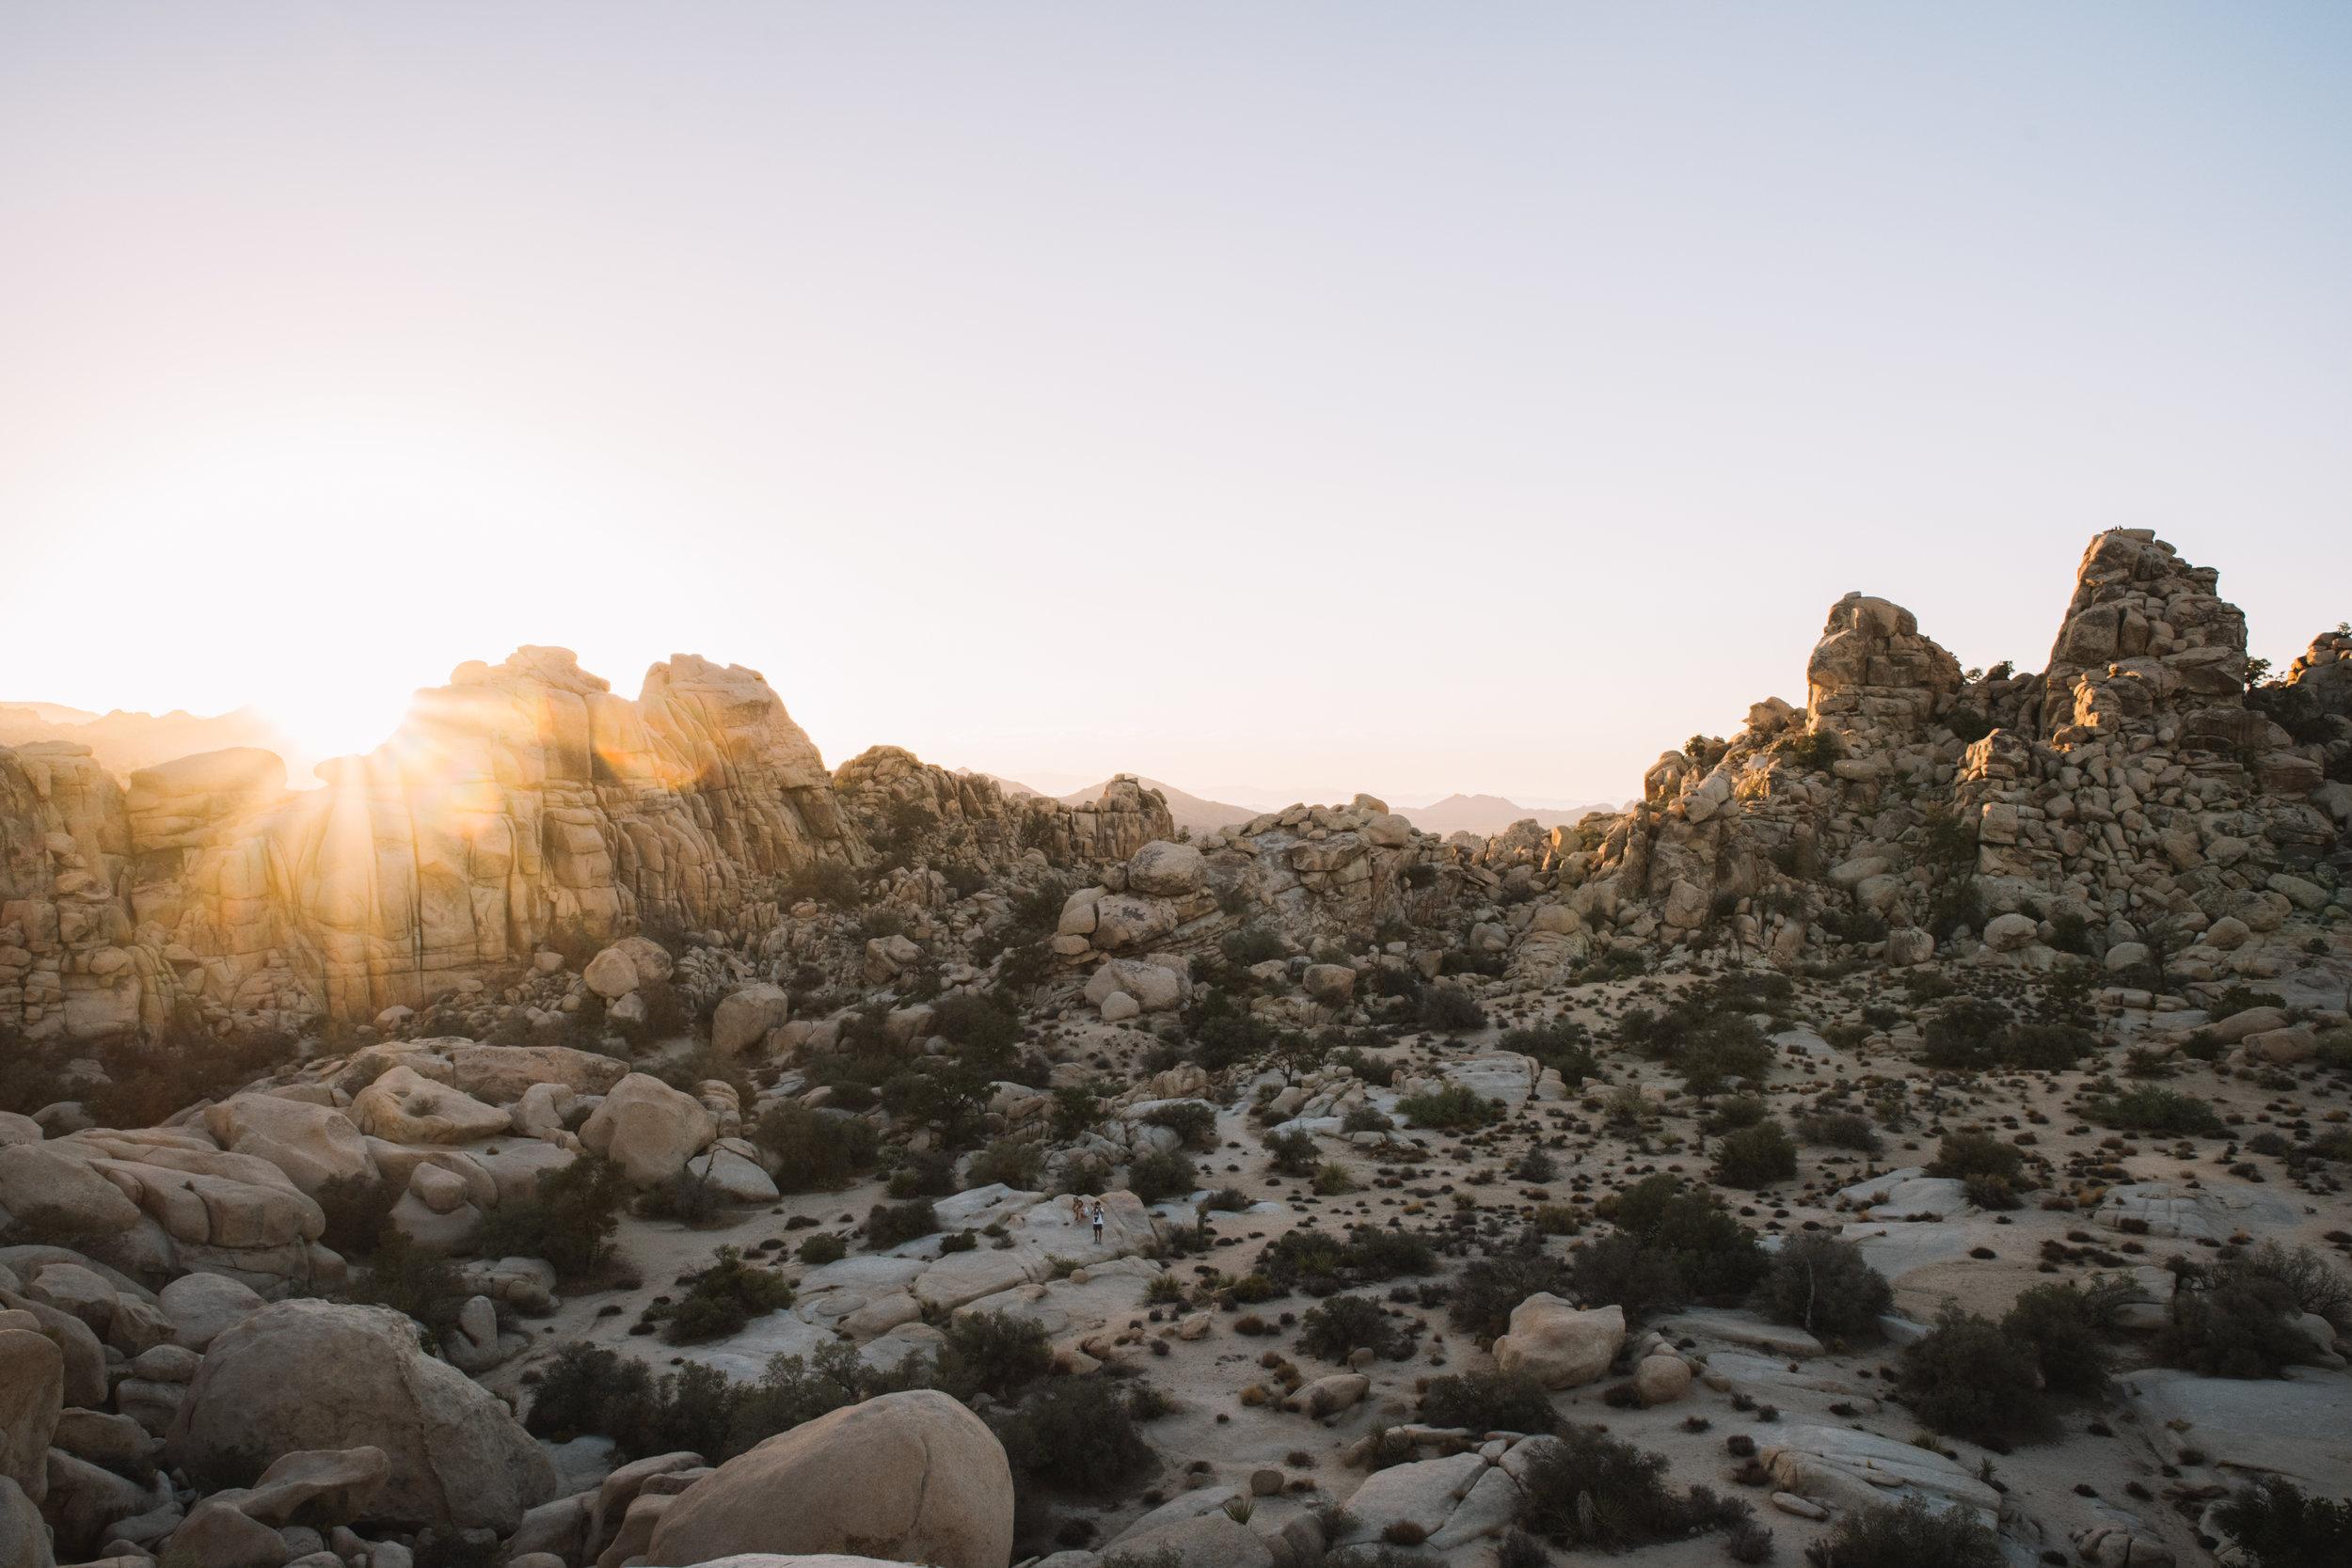 Koorakai Desert Retreat